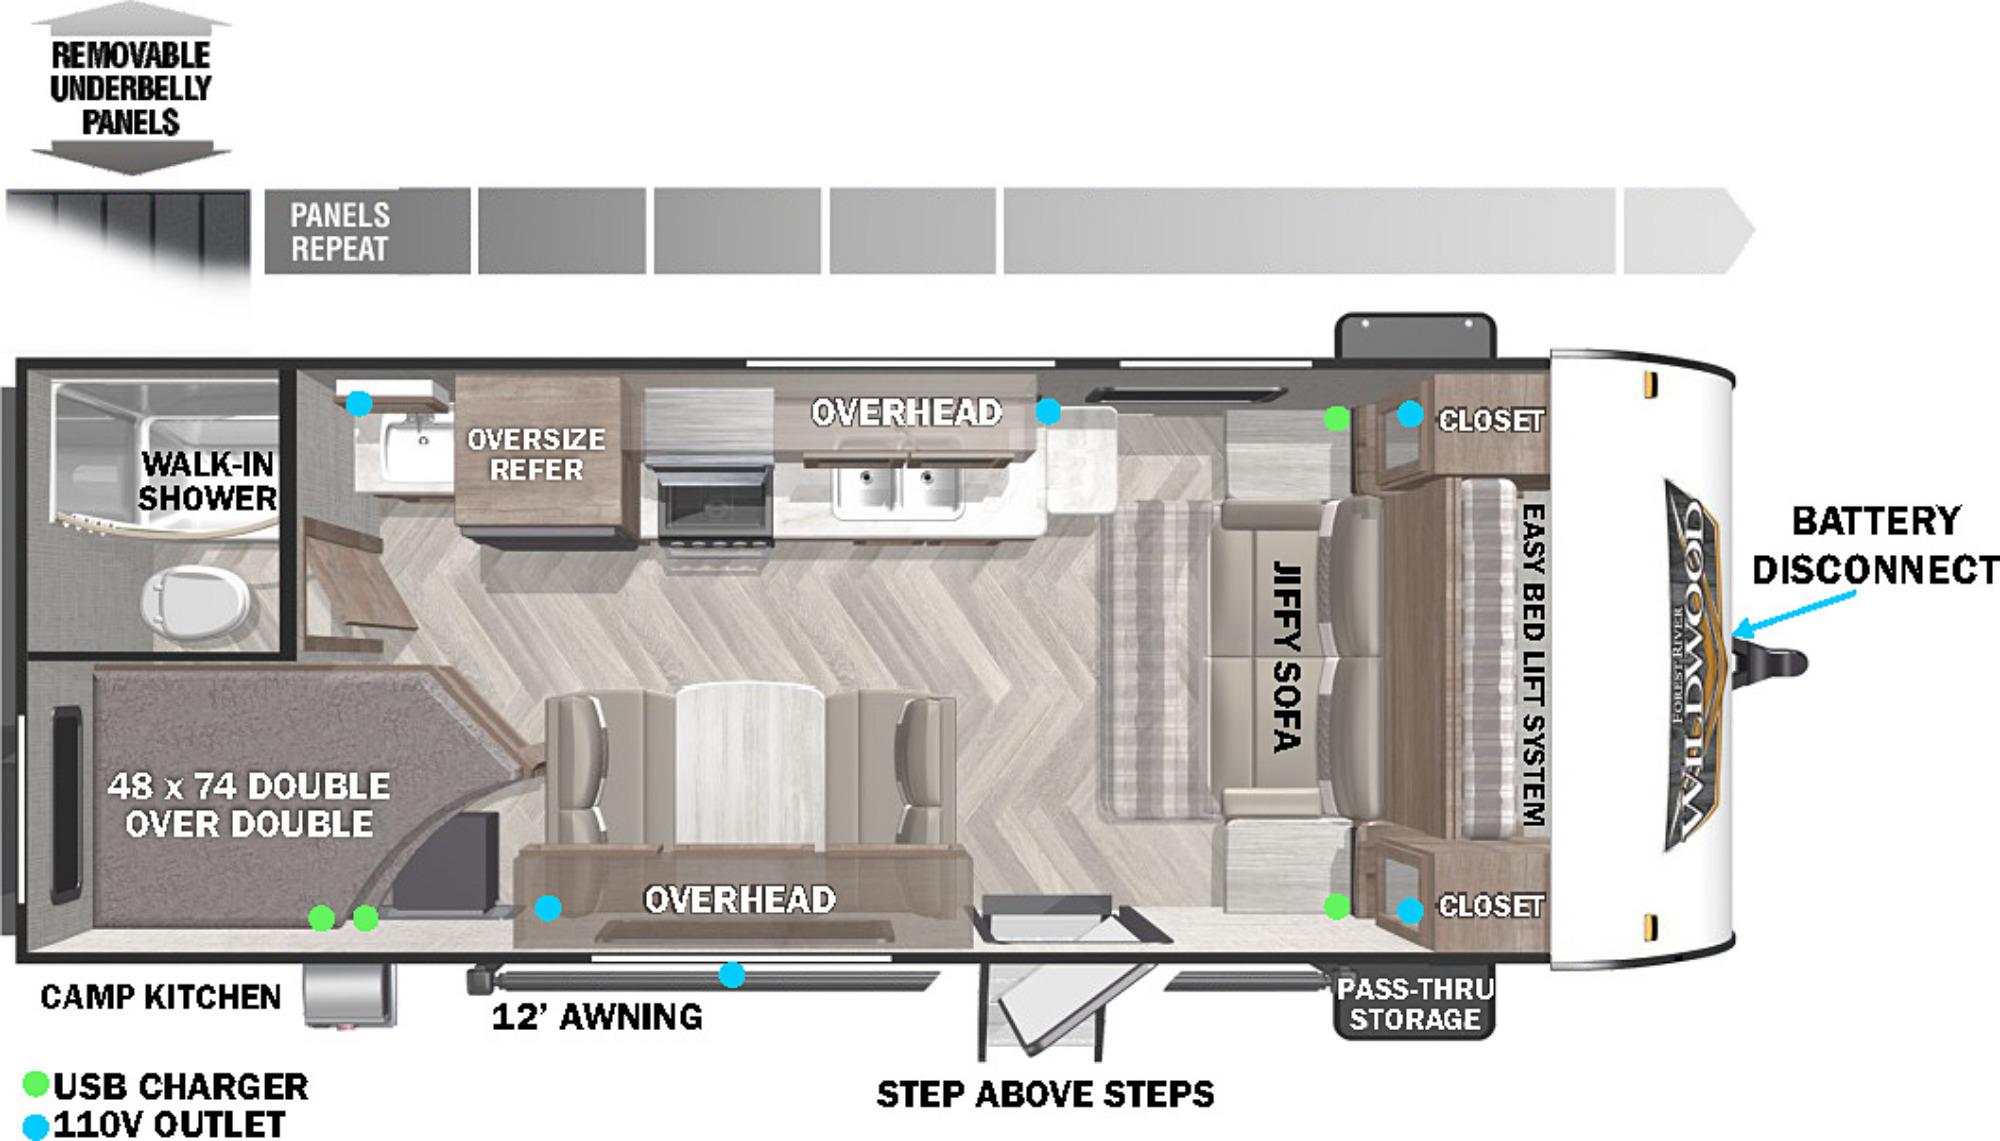 View Floor Plan for 2022 FOREST RIVER WILDWOOD X-LITE 19DBXL